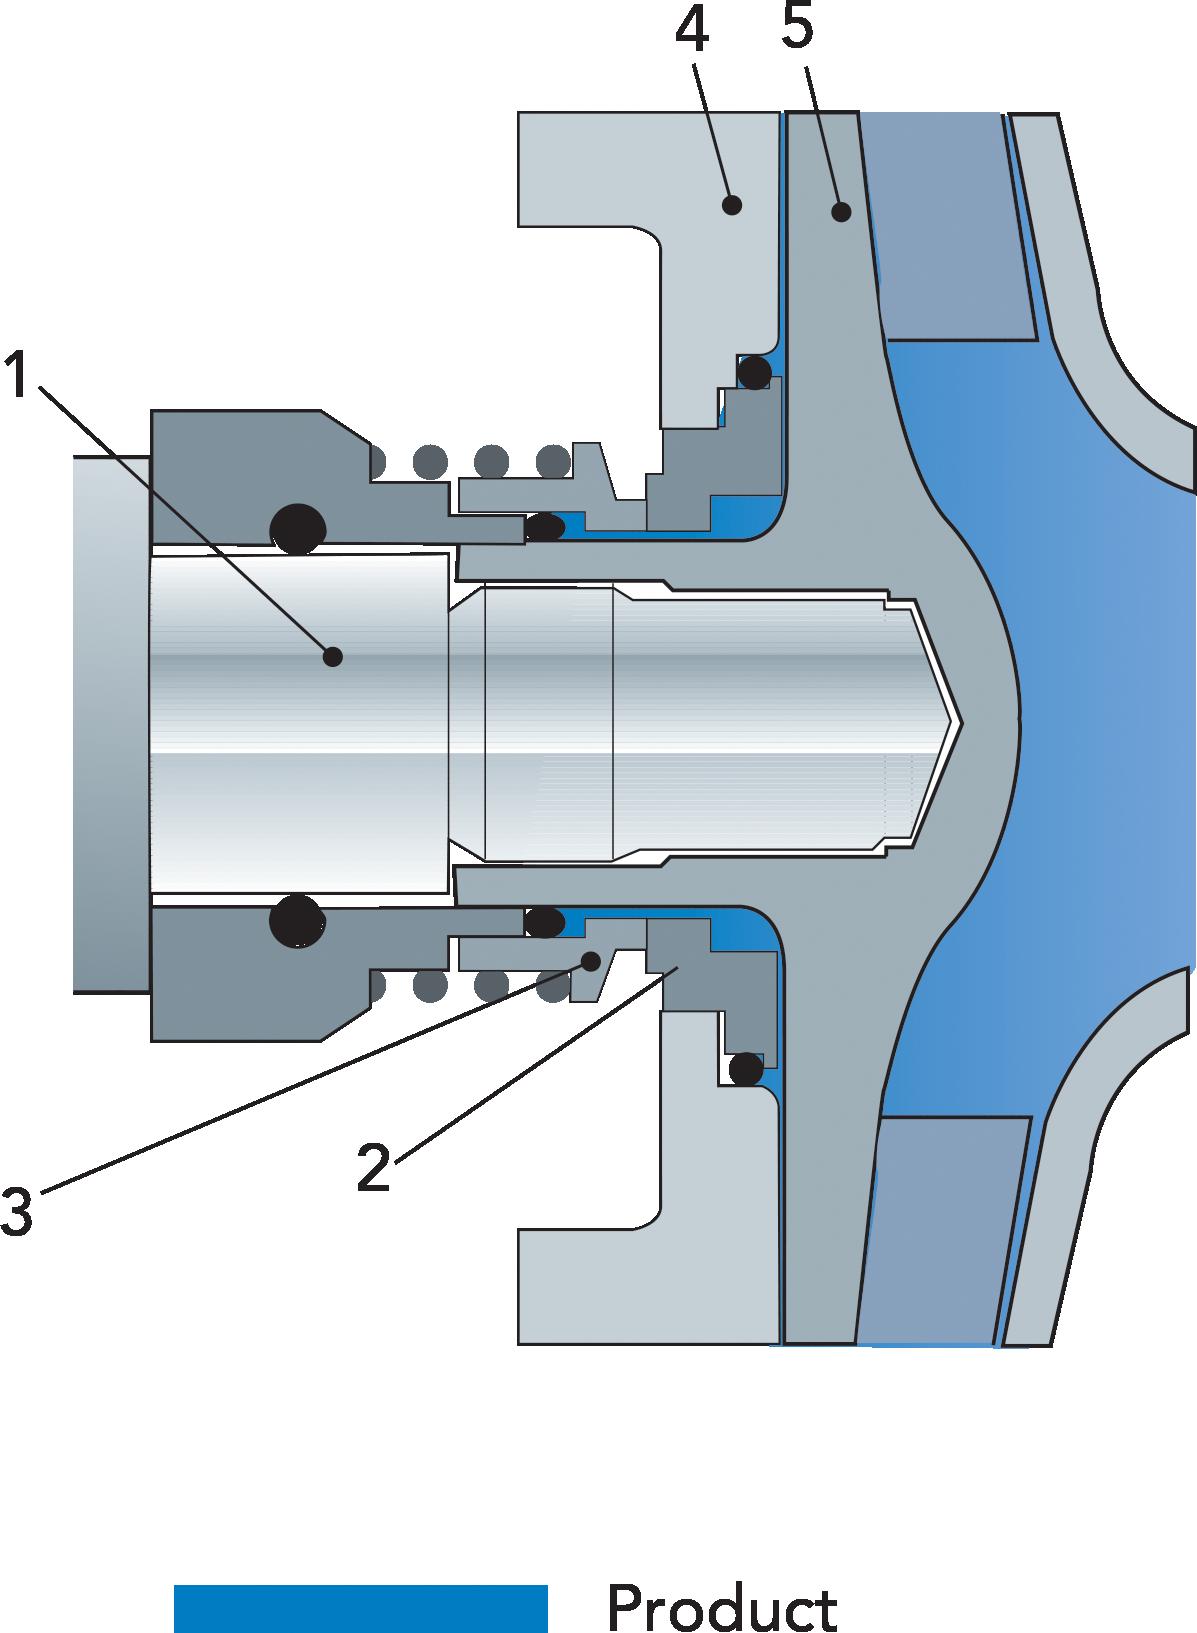 pumps | dairy processing handbook double light diagram double seal diagram #13